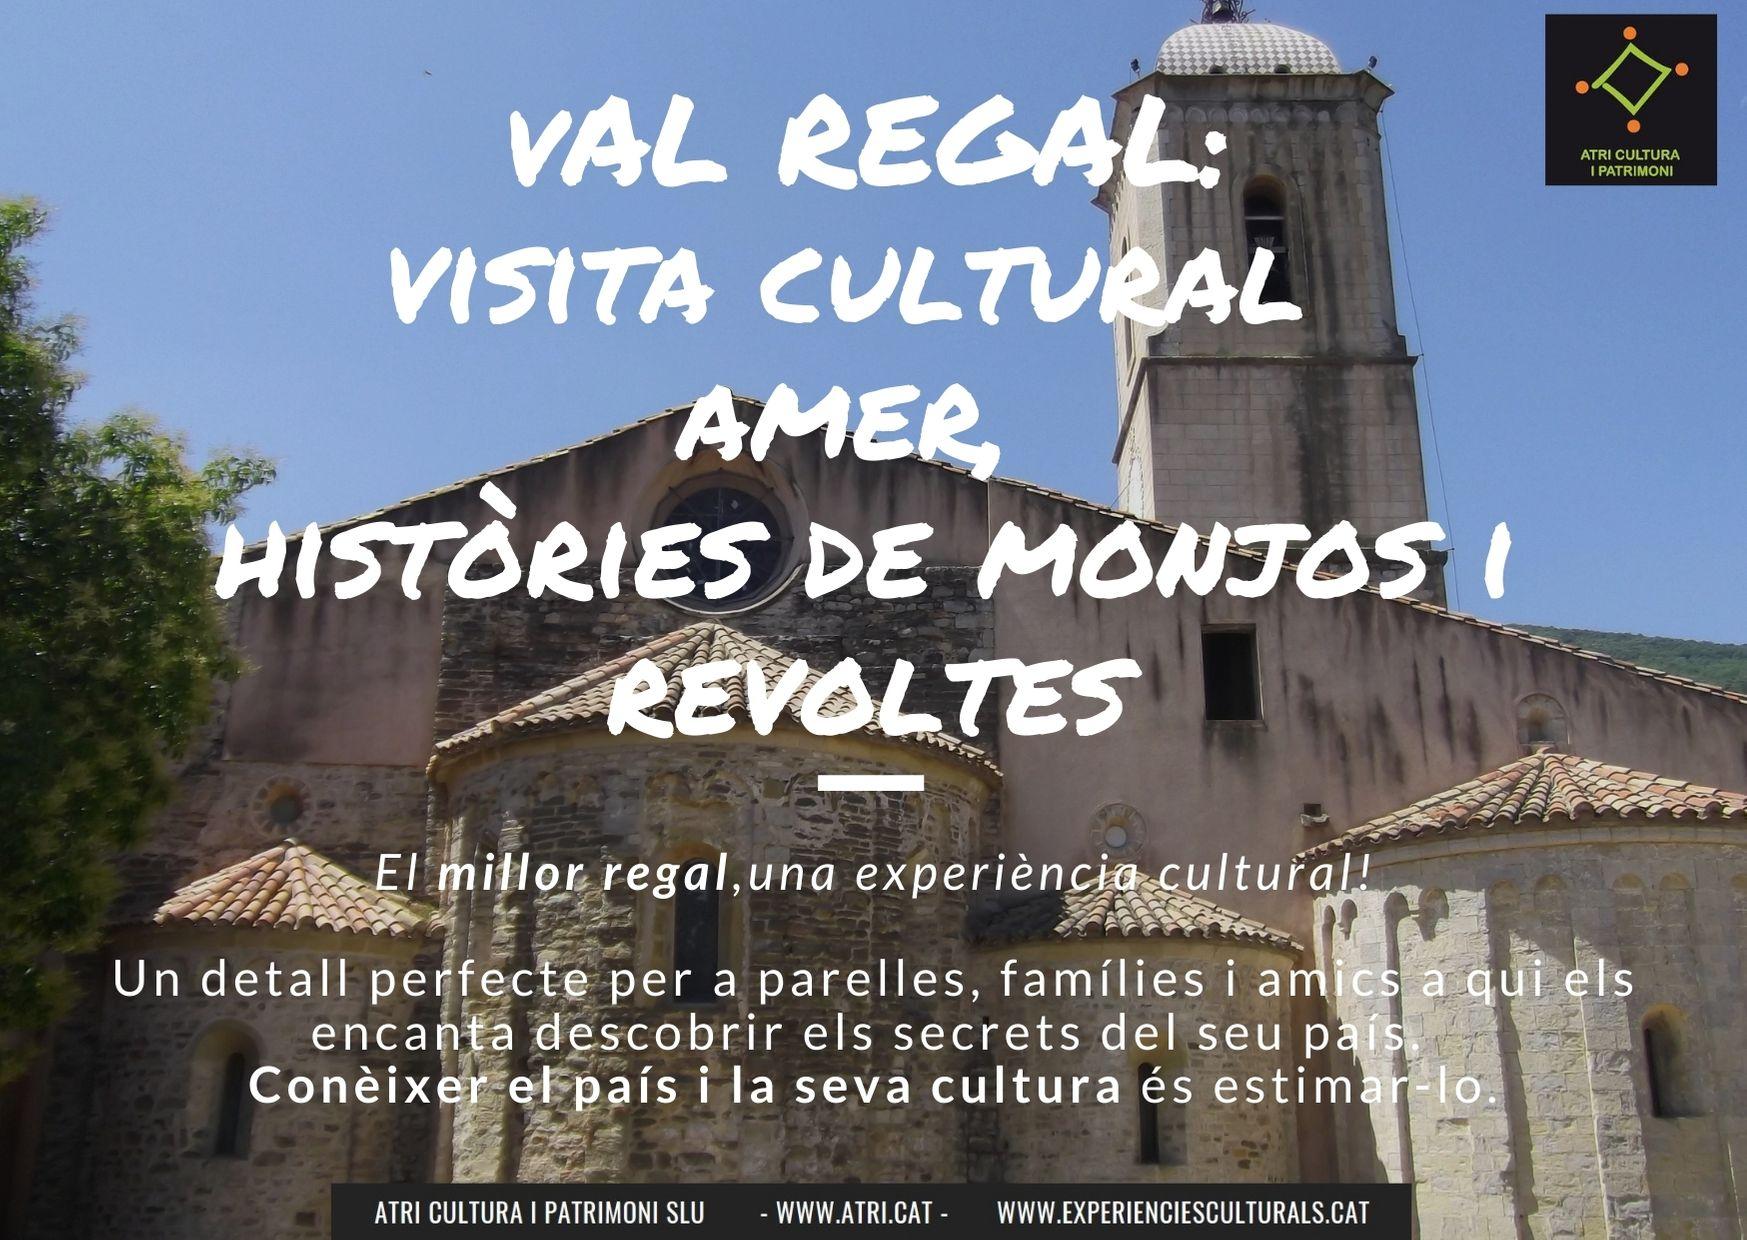 VAL_REGAL_VC07_Amer_v2